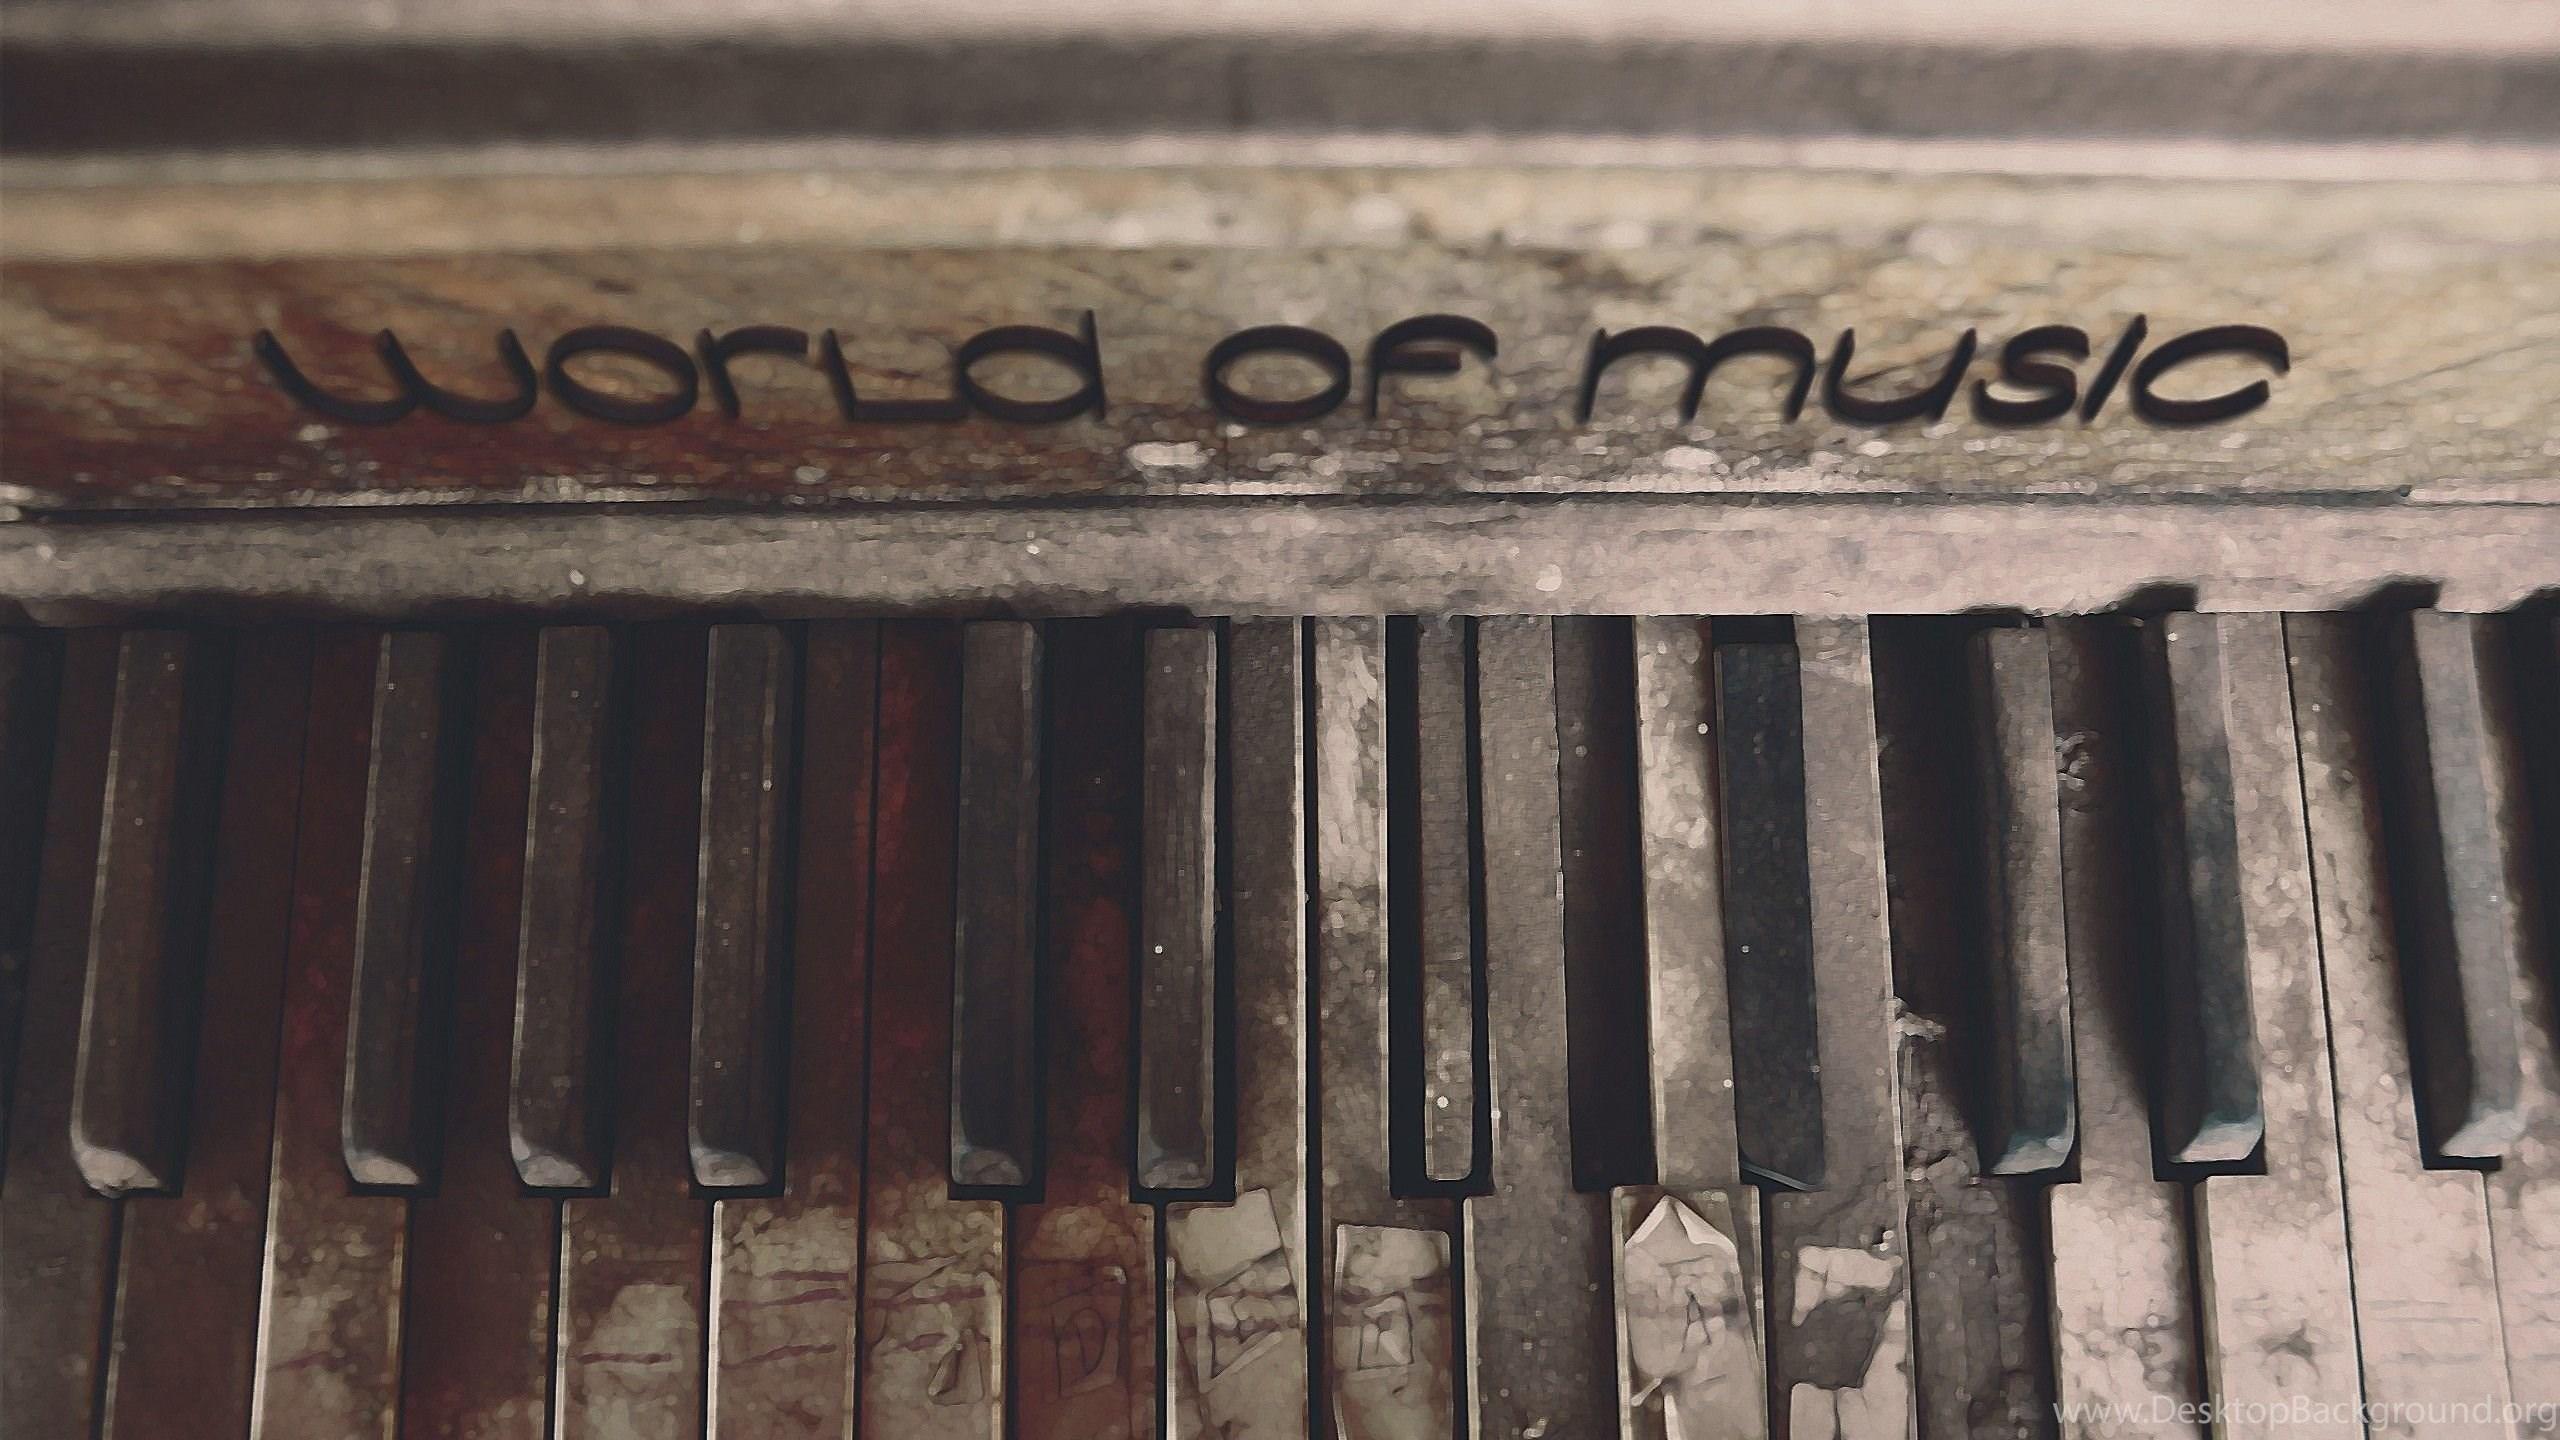 Piano Music Vintage Wallpapers Hd Desktop Background